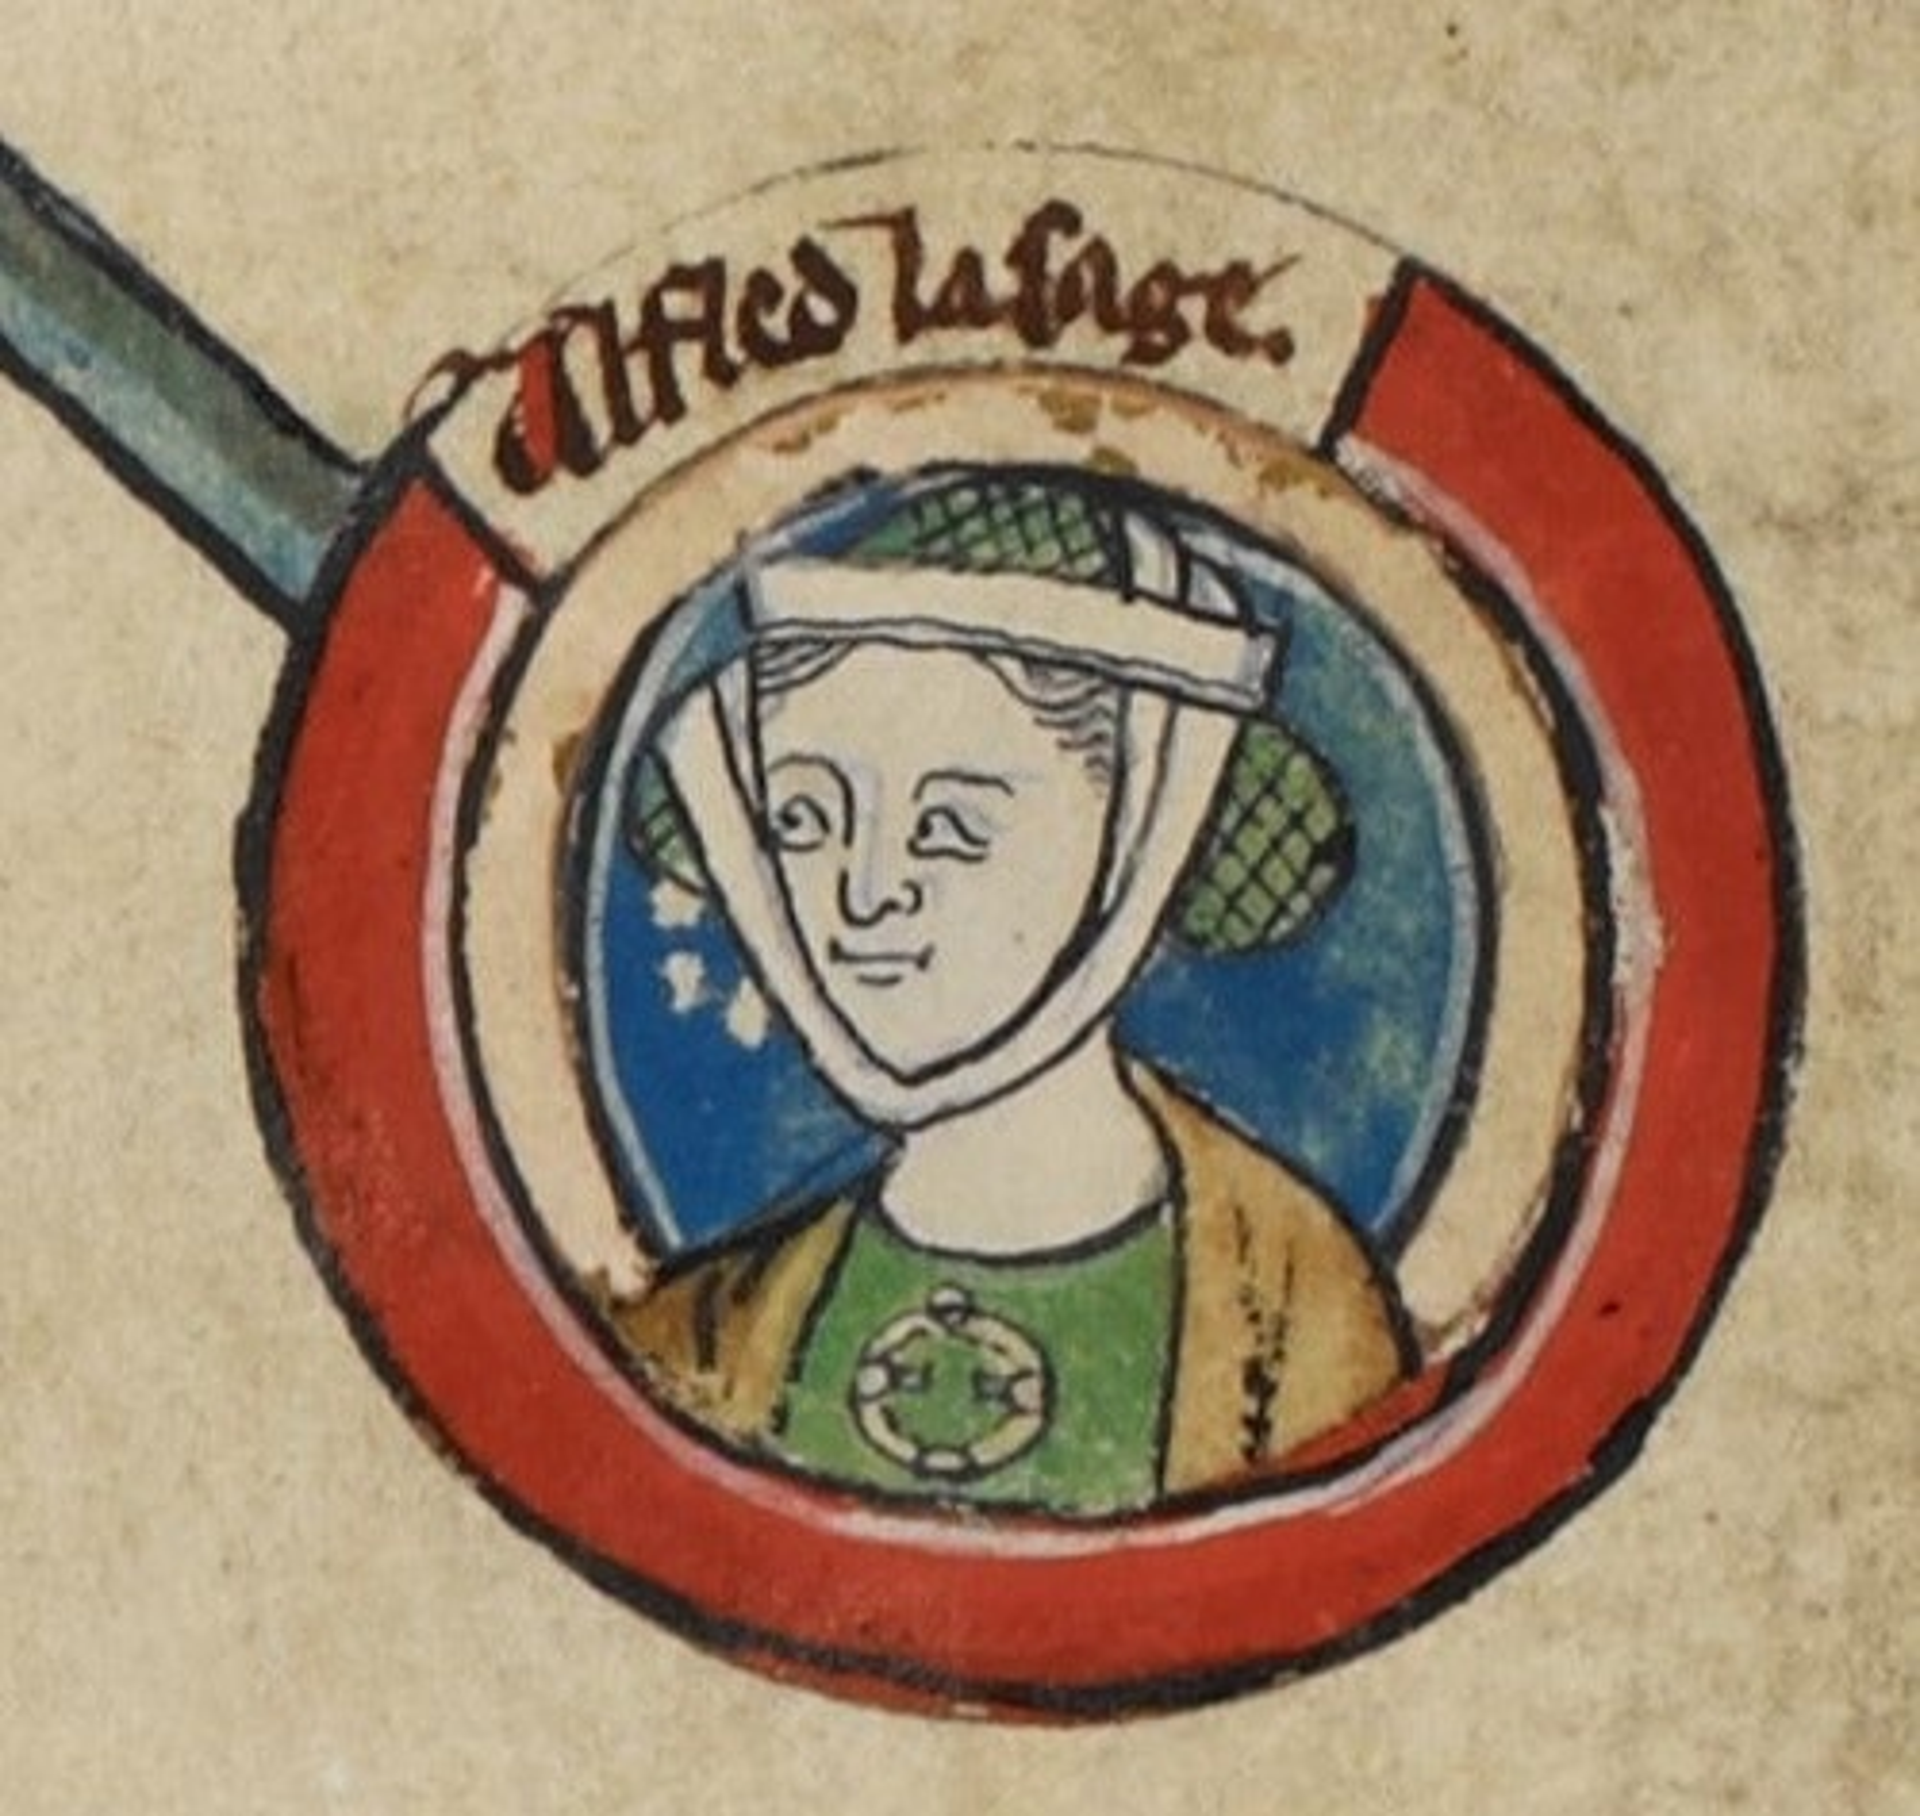 Æthelflæd: the Anglo-Saxon iron lady